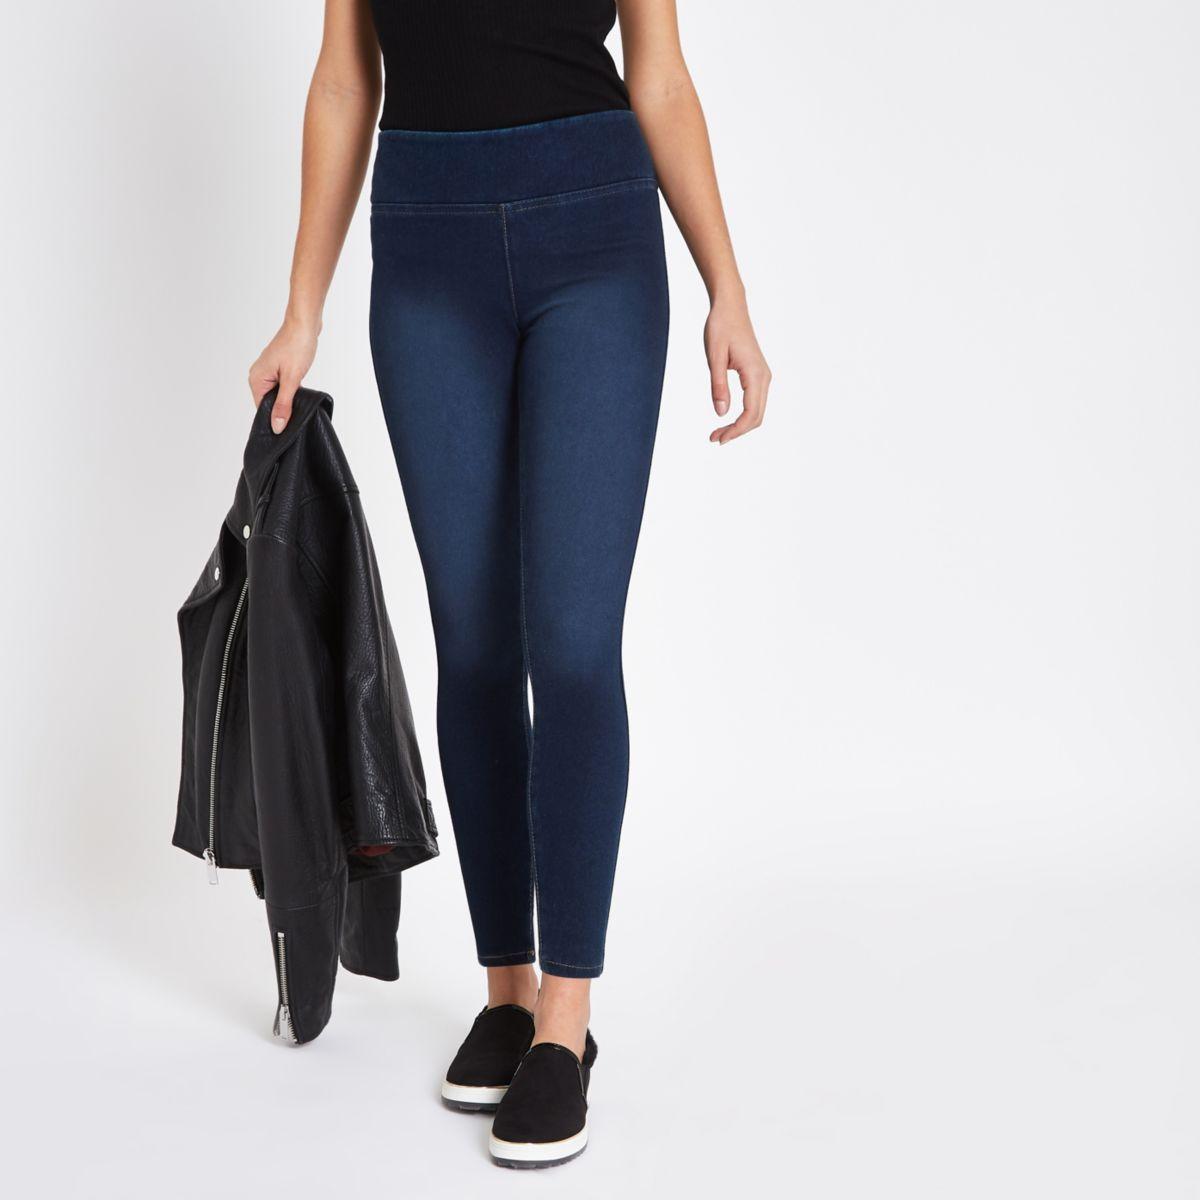 dark blue faded denim leggings leggings trousers women